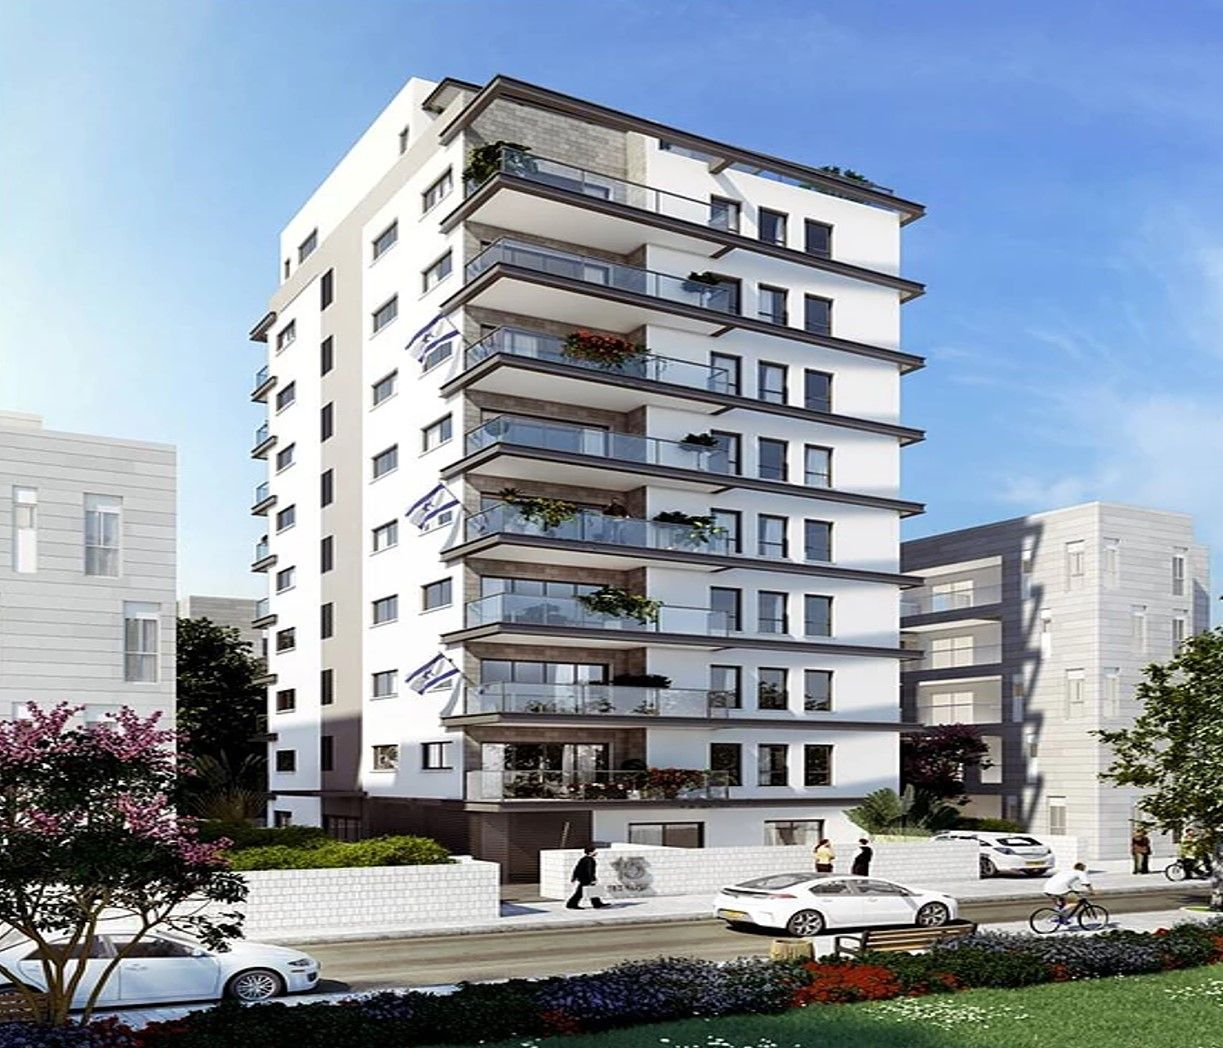 A 10-story building designed by urban rejuvenation  18